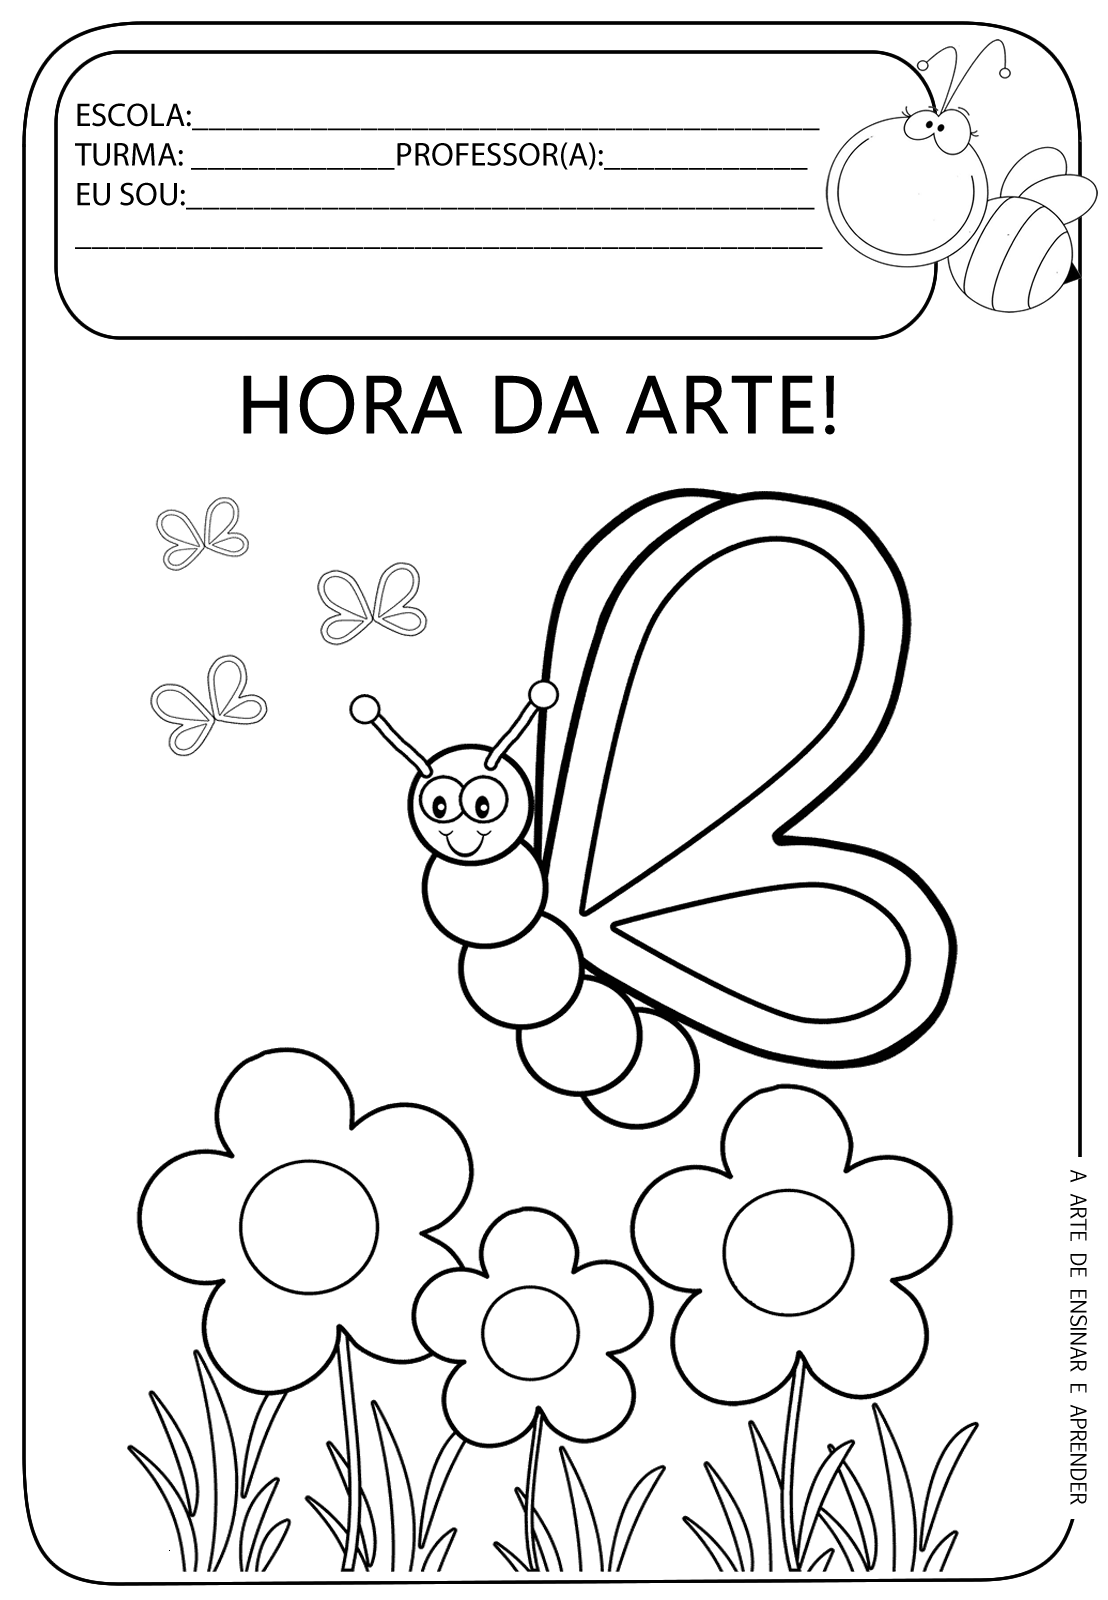 Pin de JANE CARVALHO en escola fvb | Pinterest | Primavera, Dibujos ...